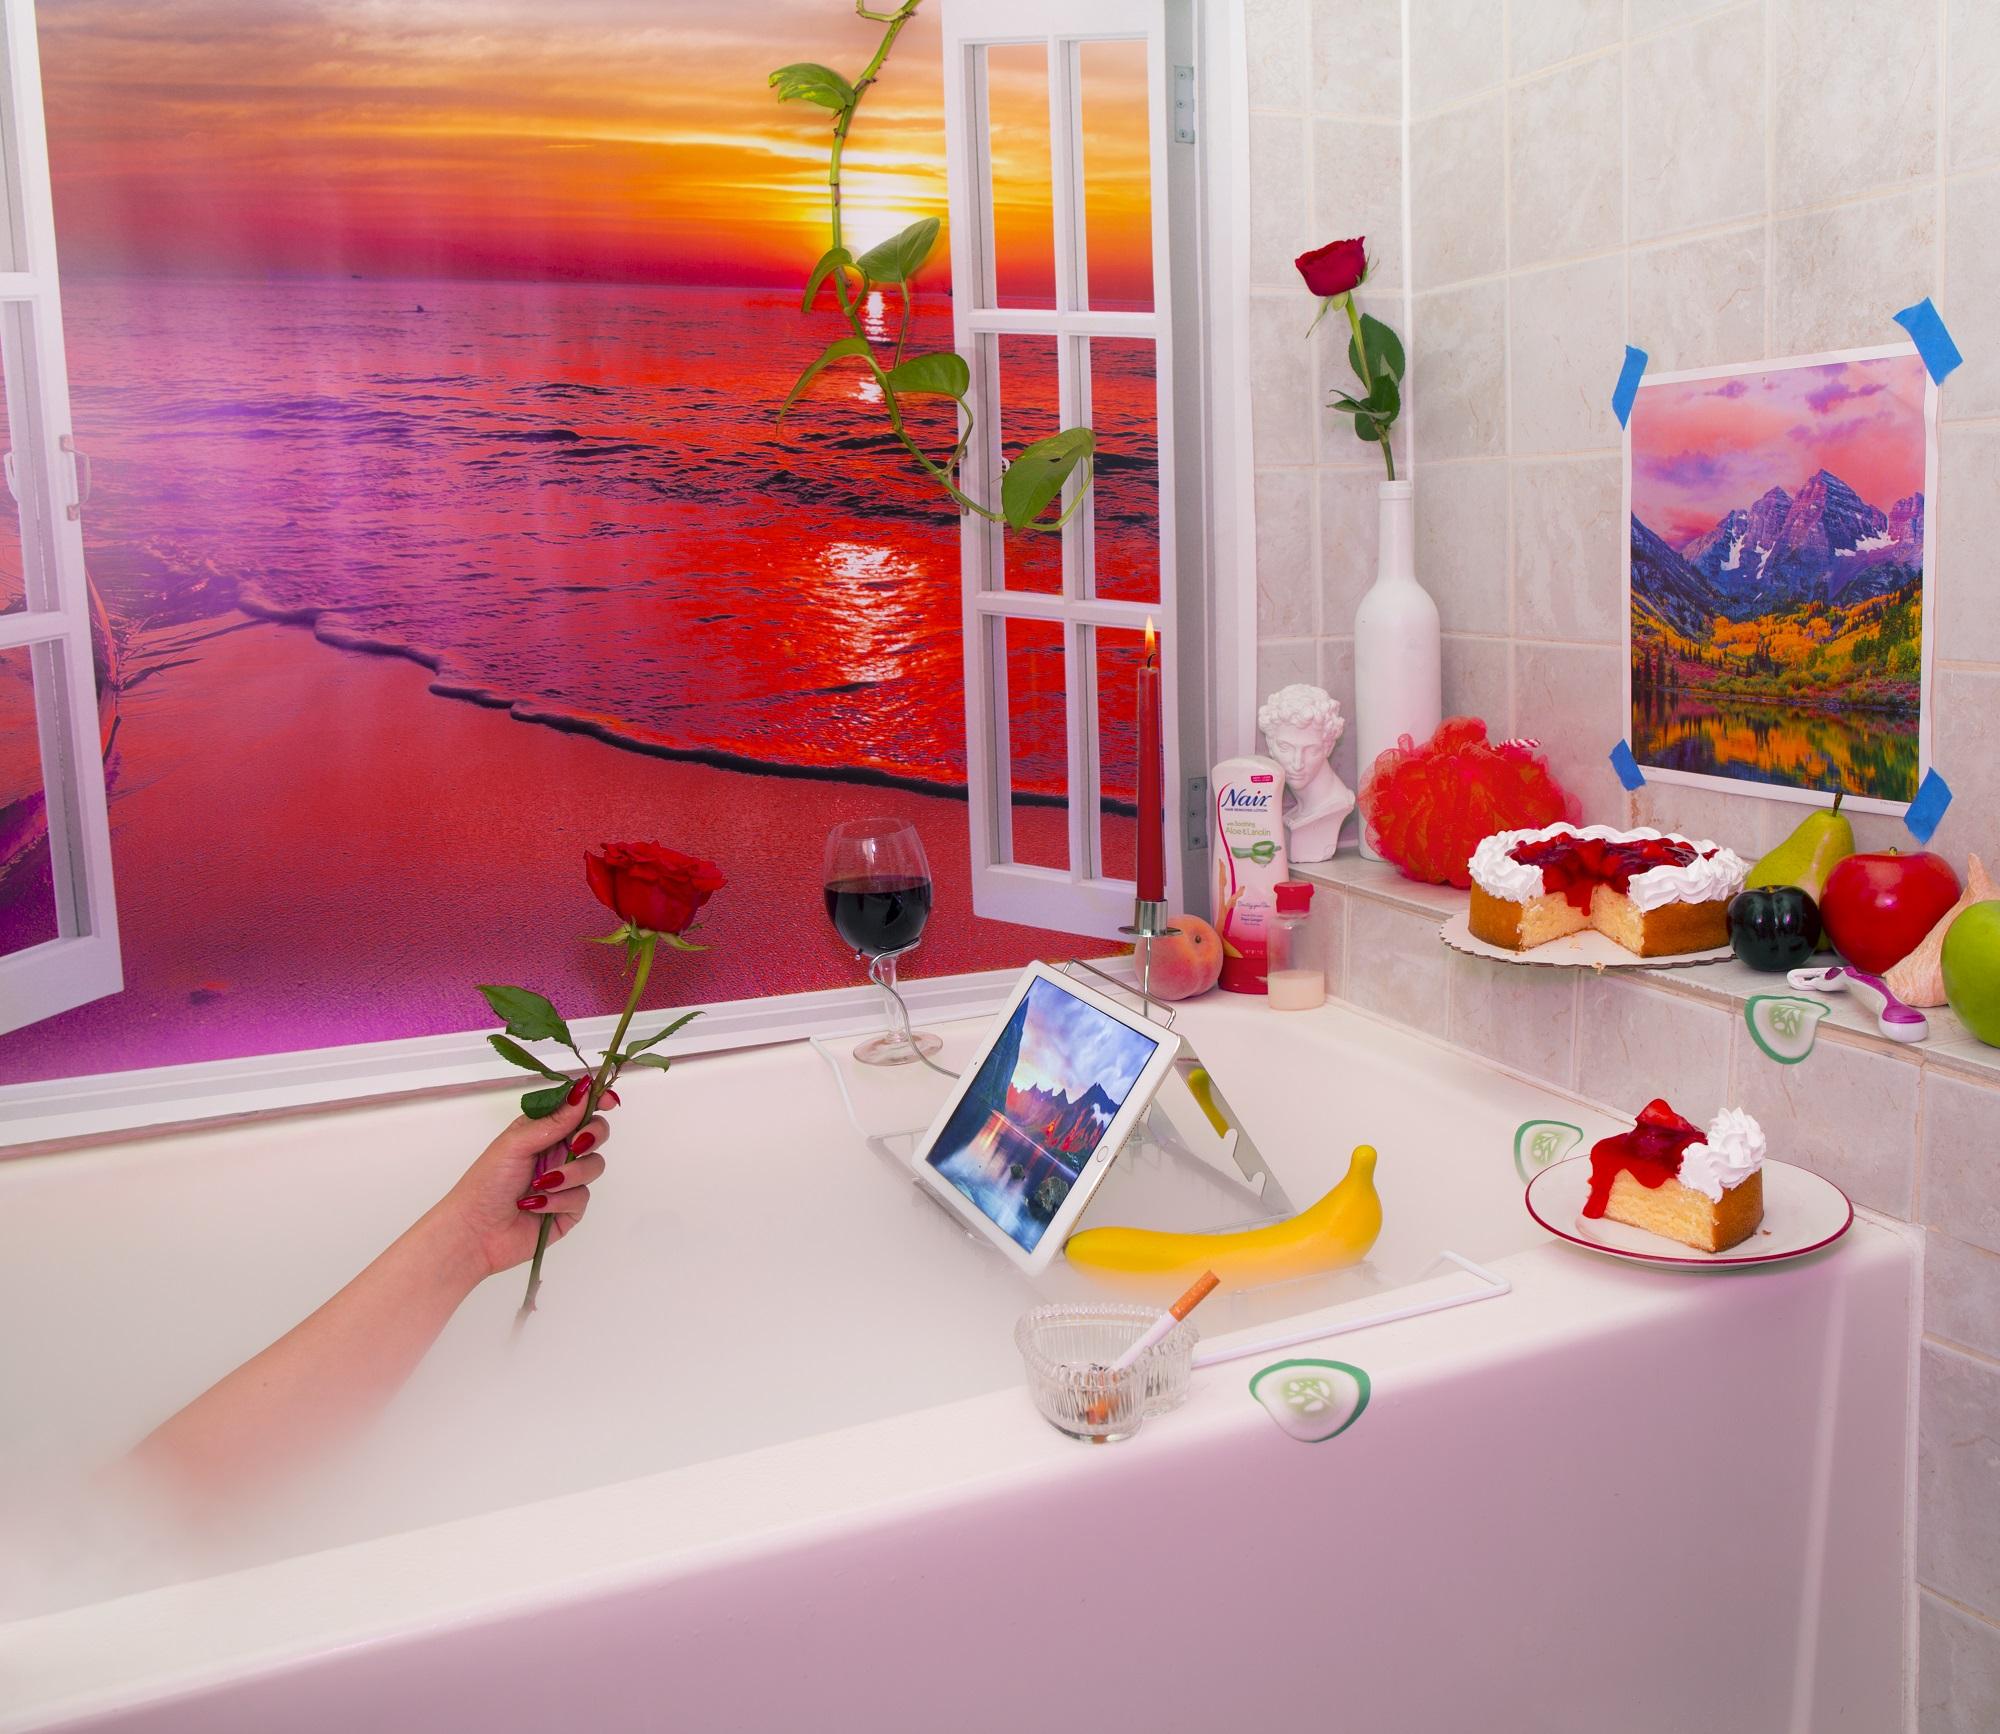 Aleia Murawski and Alex Wallbaum, Escapist Bathtub, 2019